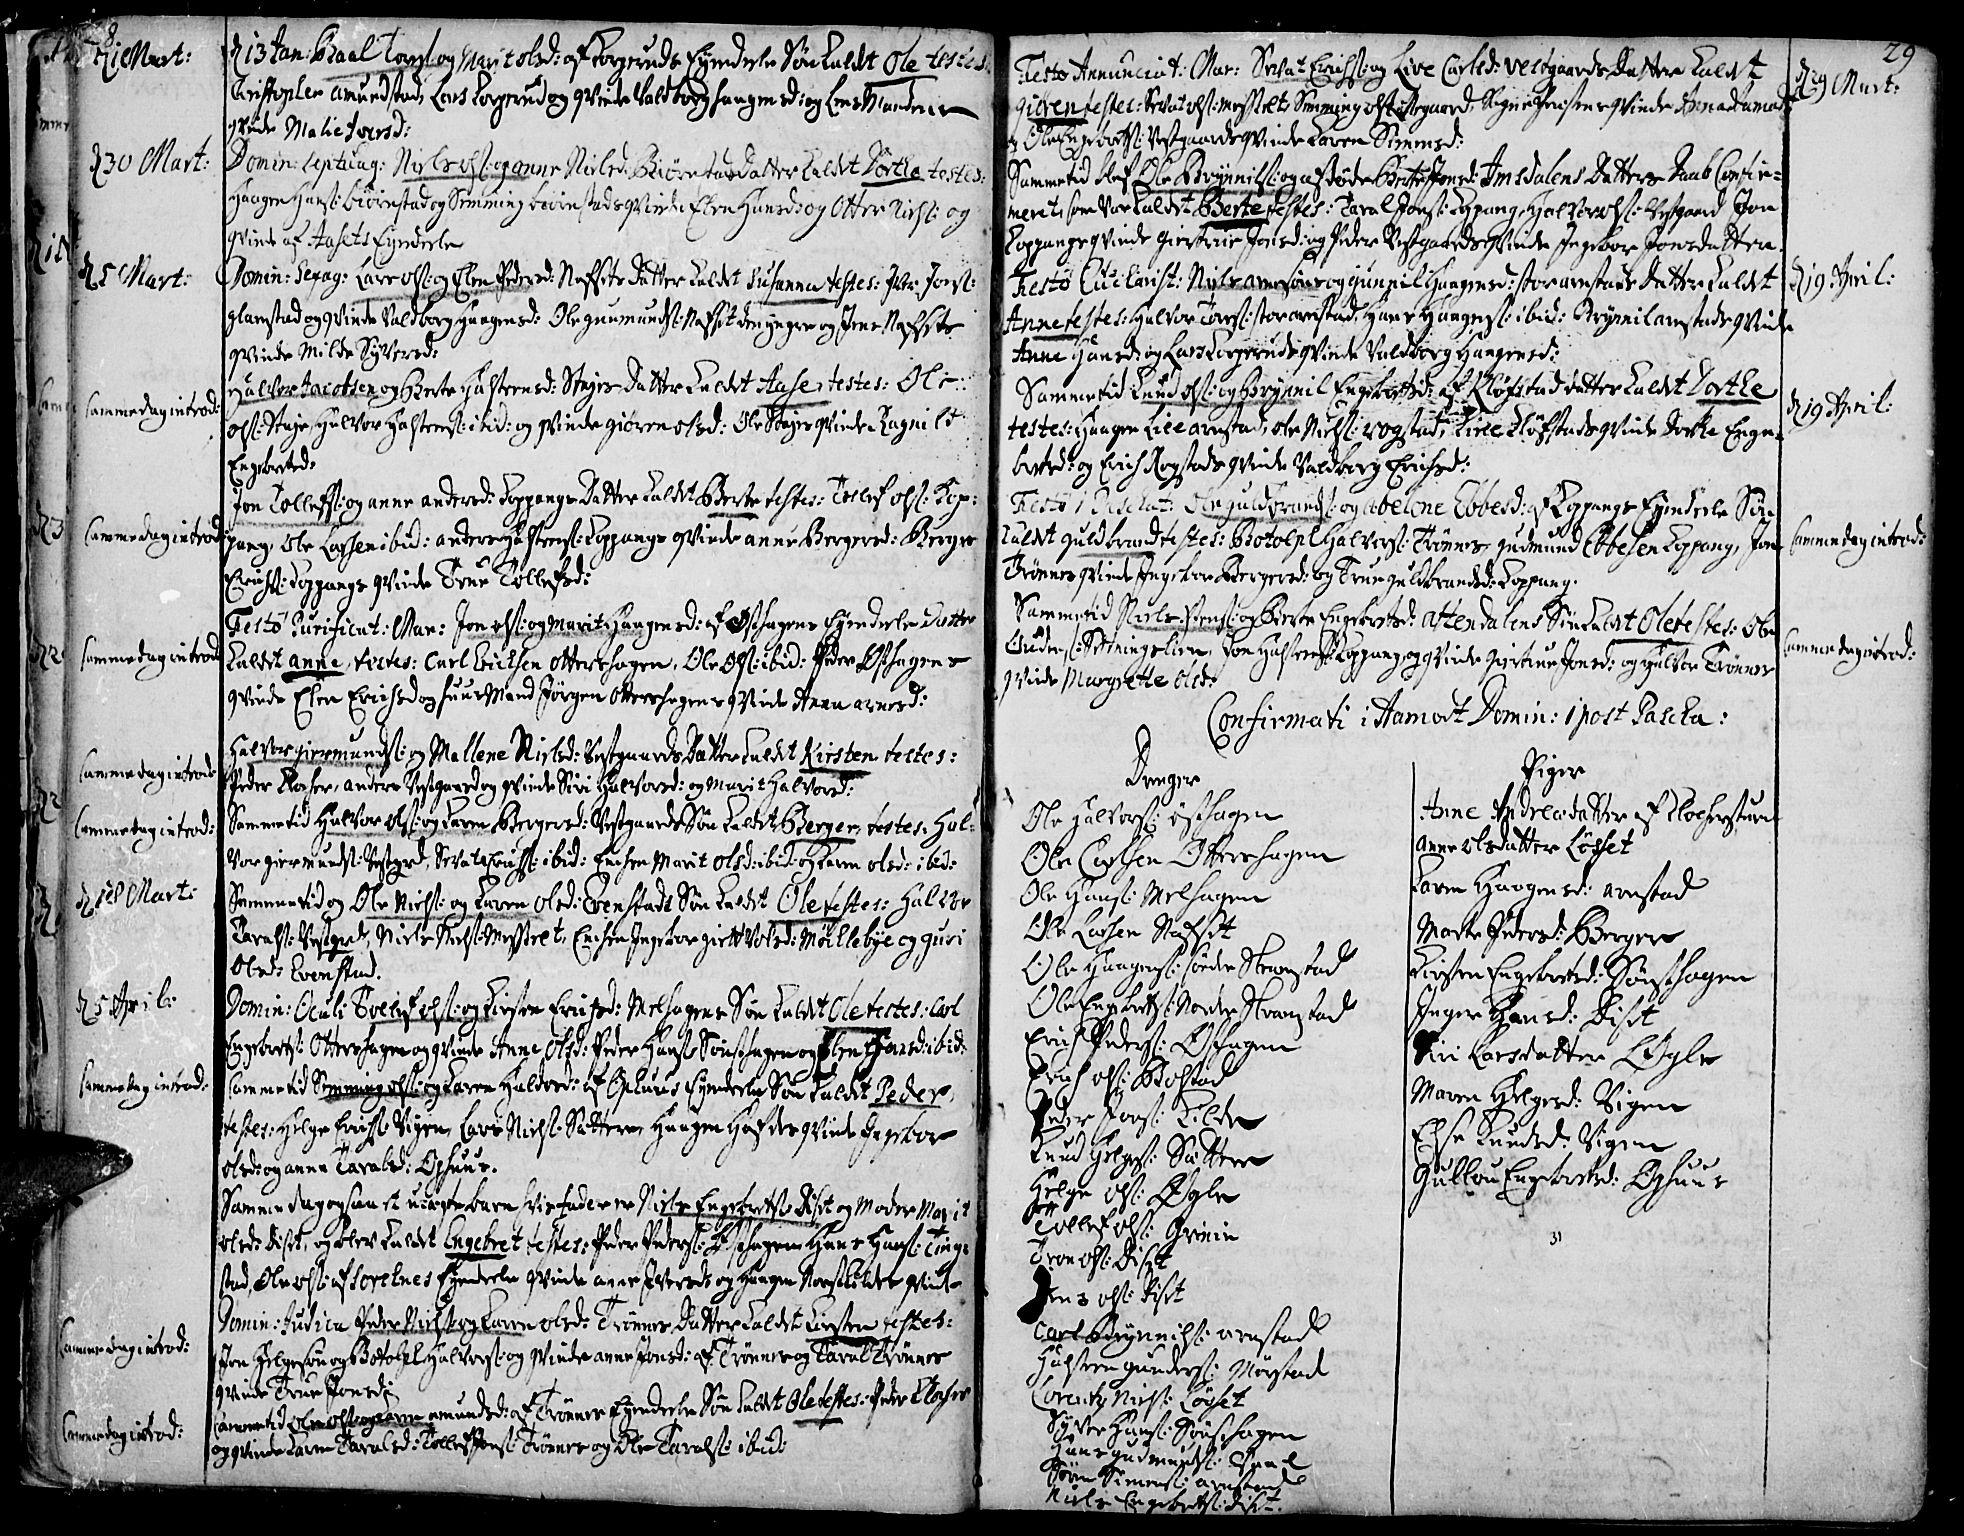 SAH, Åmot prestekontor, Ministerialbok nr. 2, 1734-1779, s. 28-29